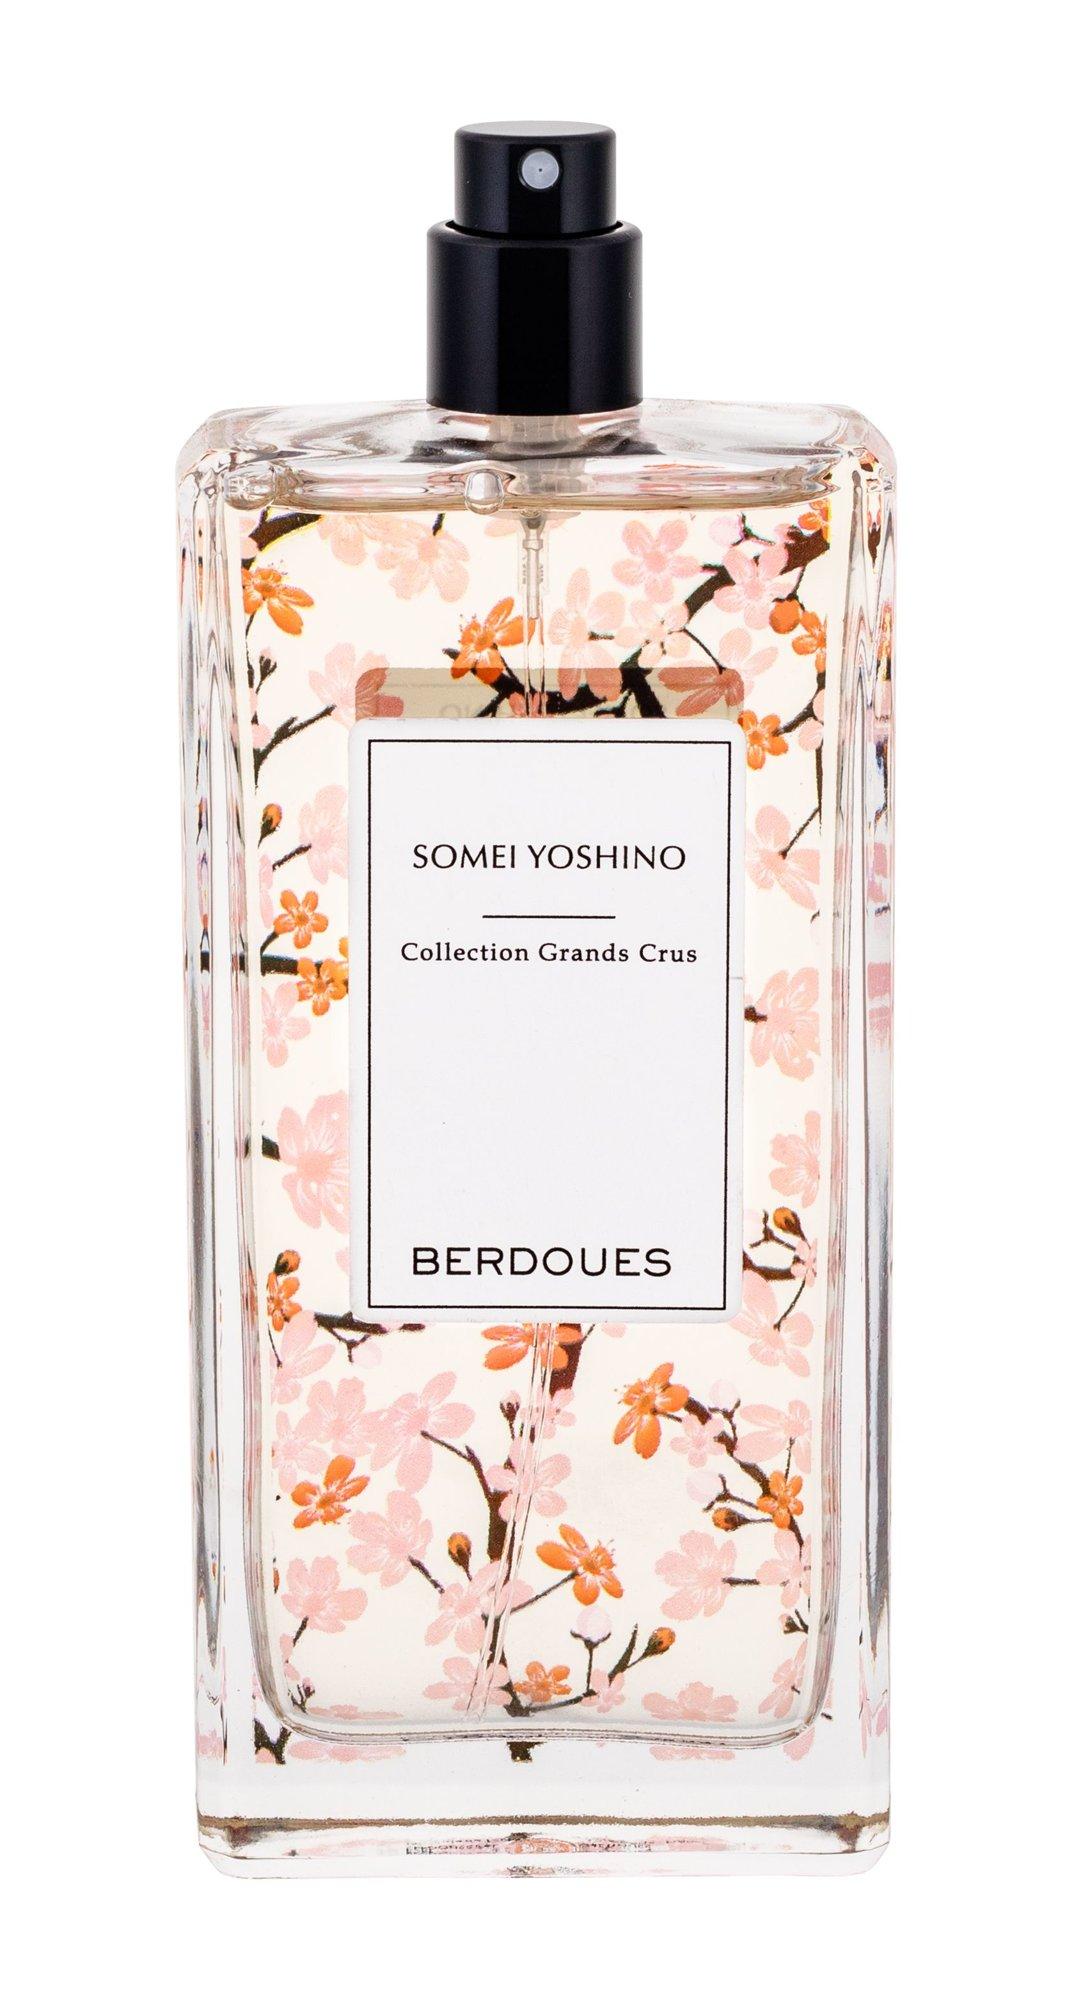 Berdoues Collection Grands Crus Somei Yoshino EDP 100ml